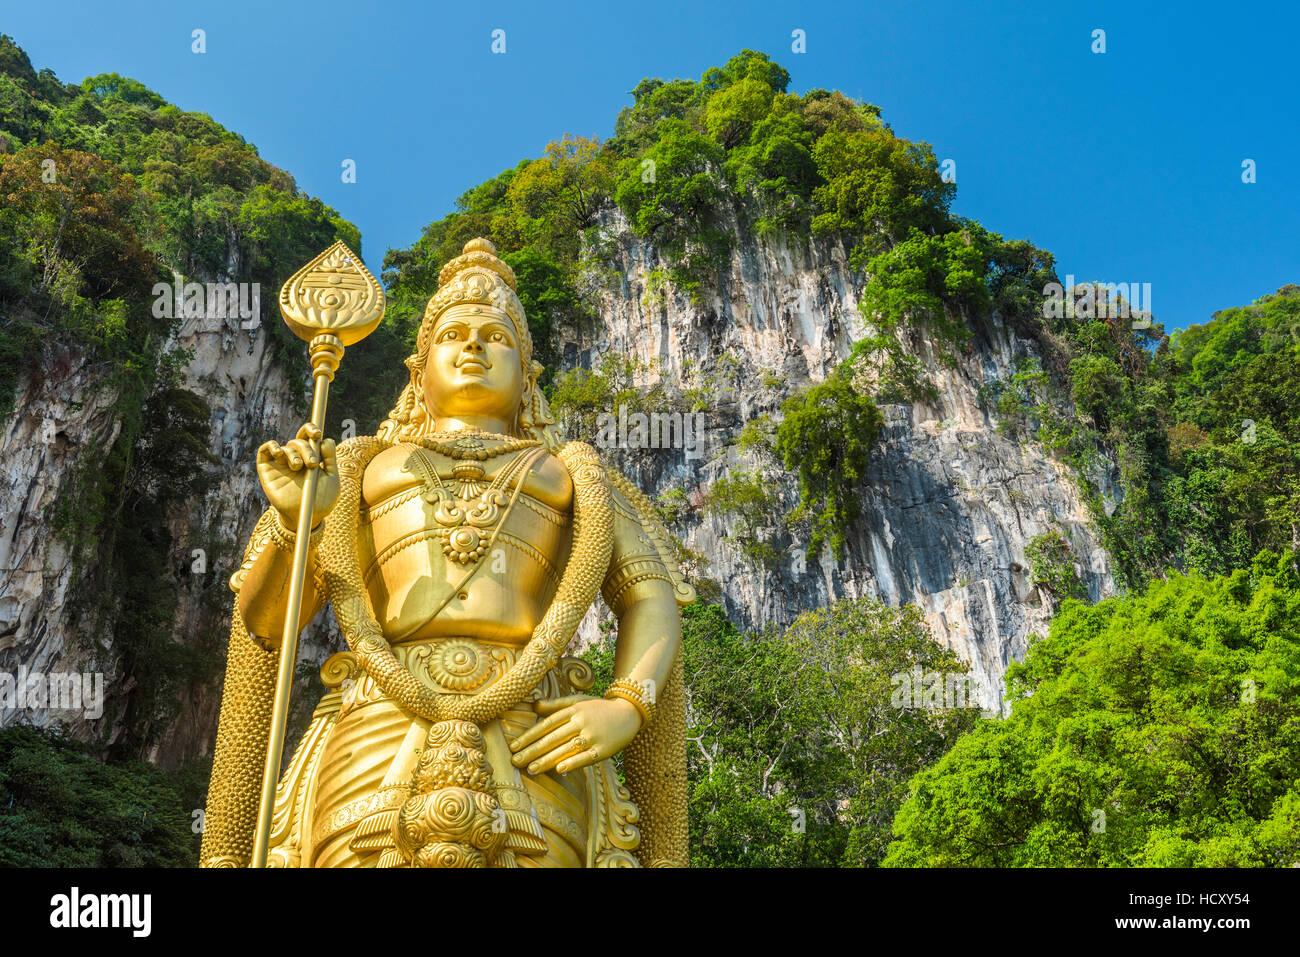 Signore Murugan statua, la più grande statua di una divinità Indù in Malaysia all'ingresso Grotte Immagini Stock